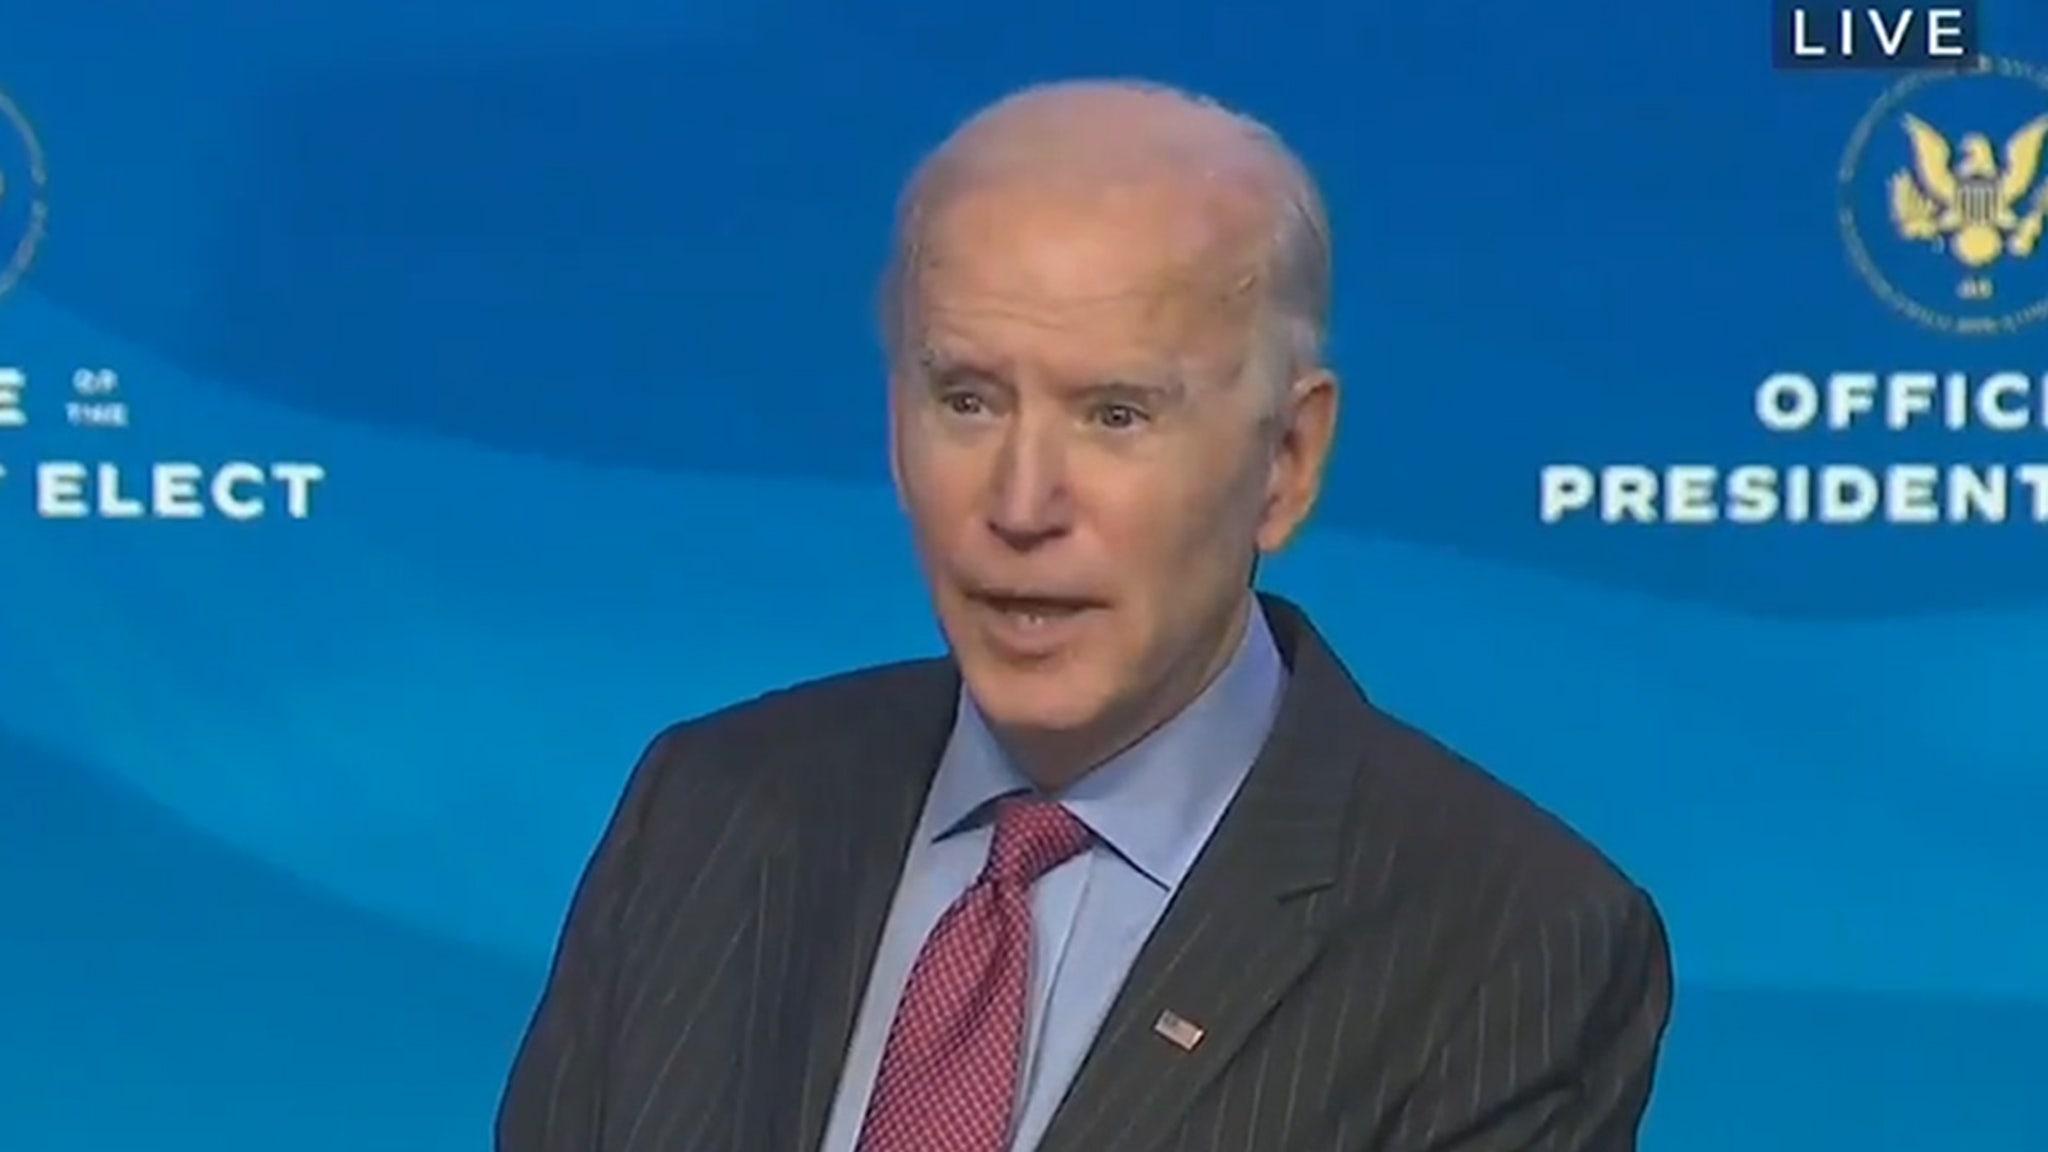 President Trump Won't Attend Joe Biden's Inauguration, Biden Says 'Good'